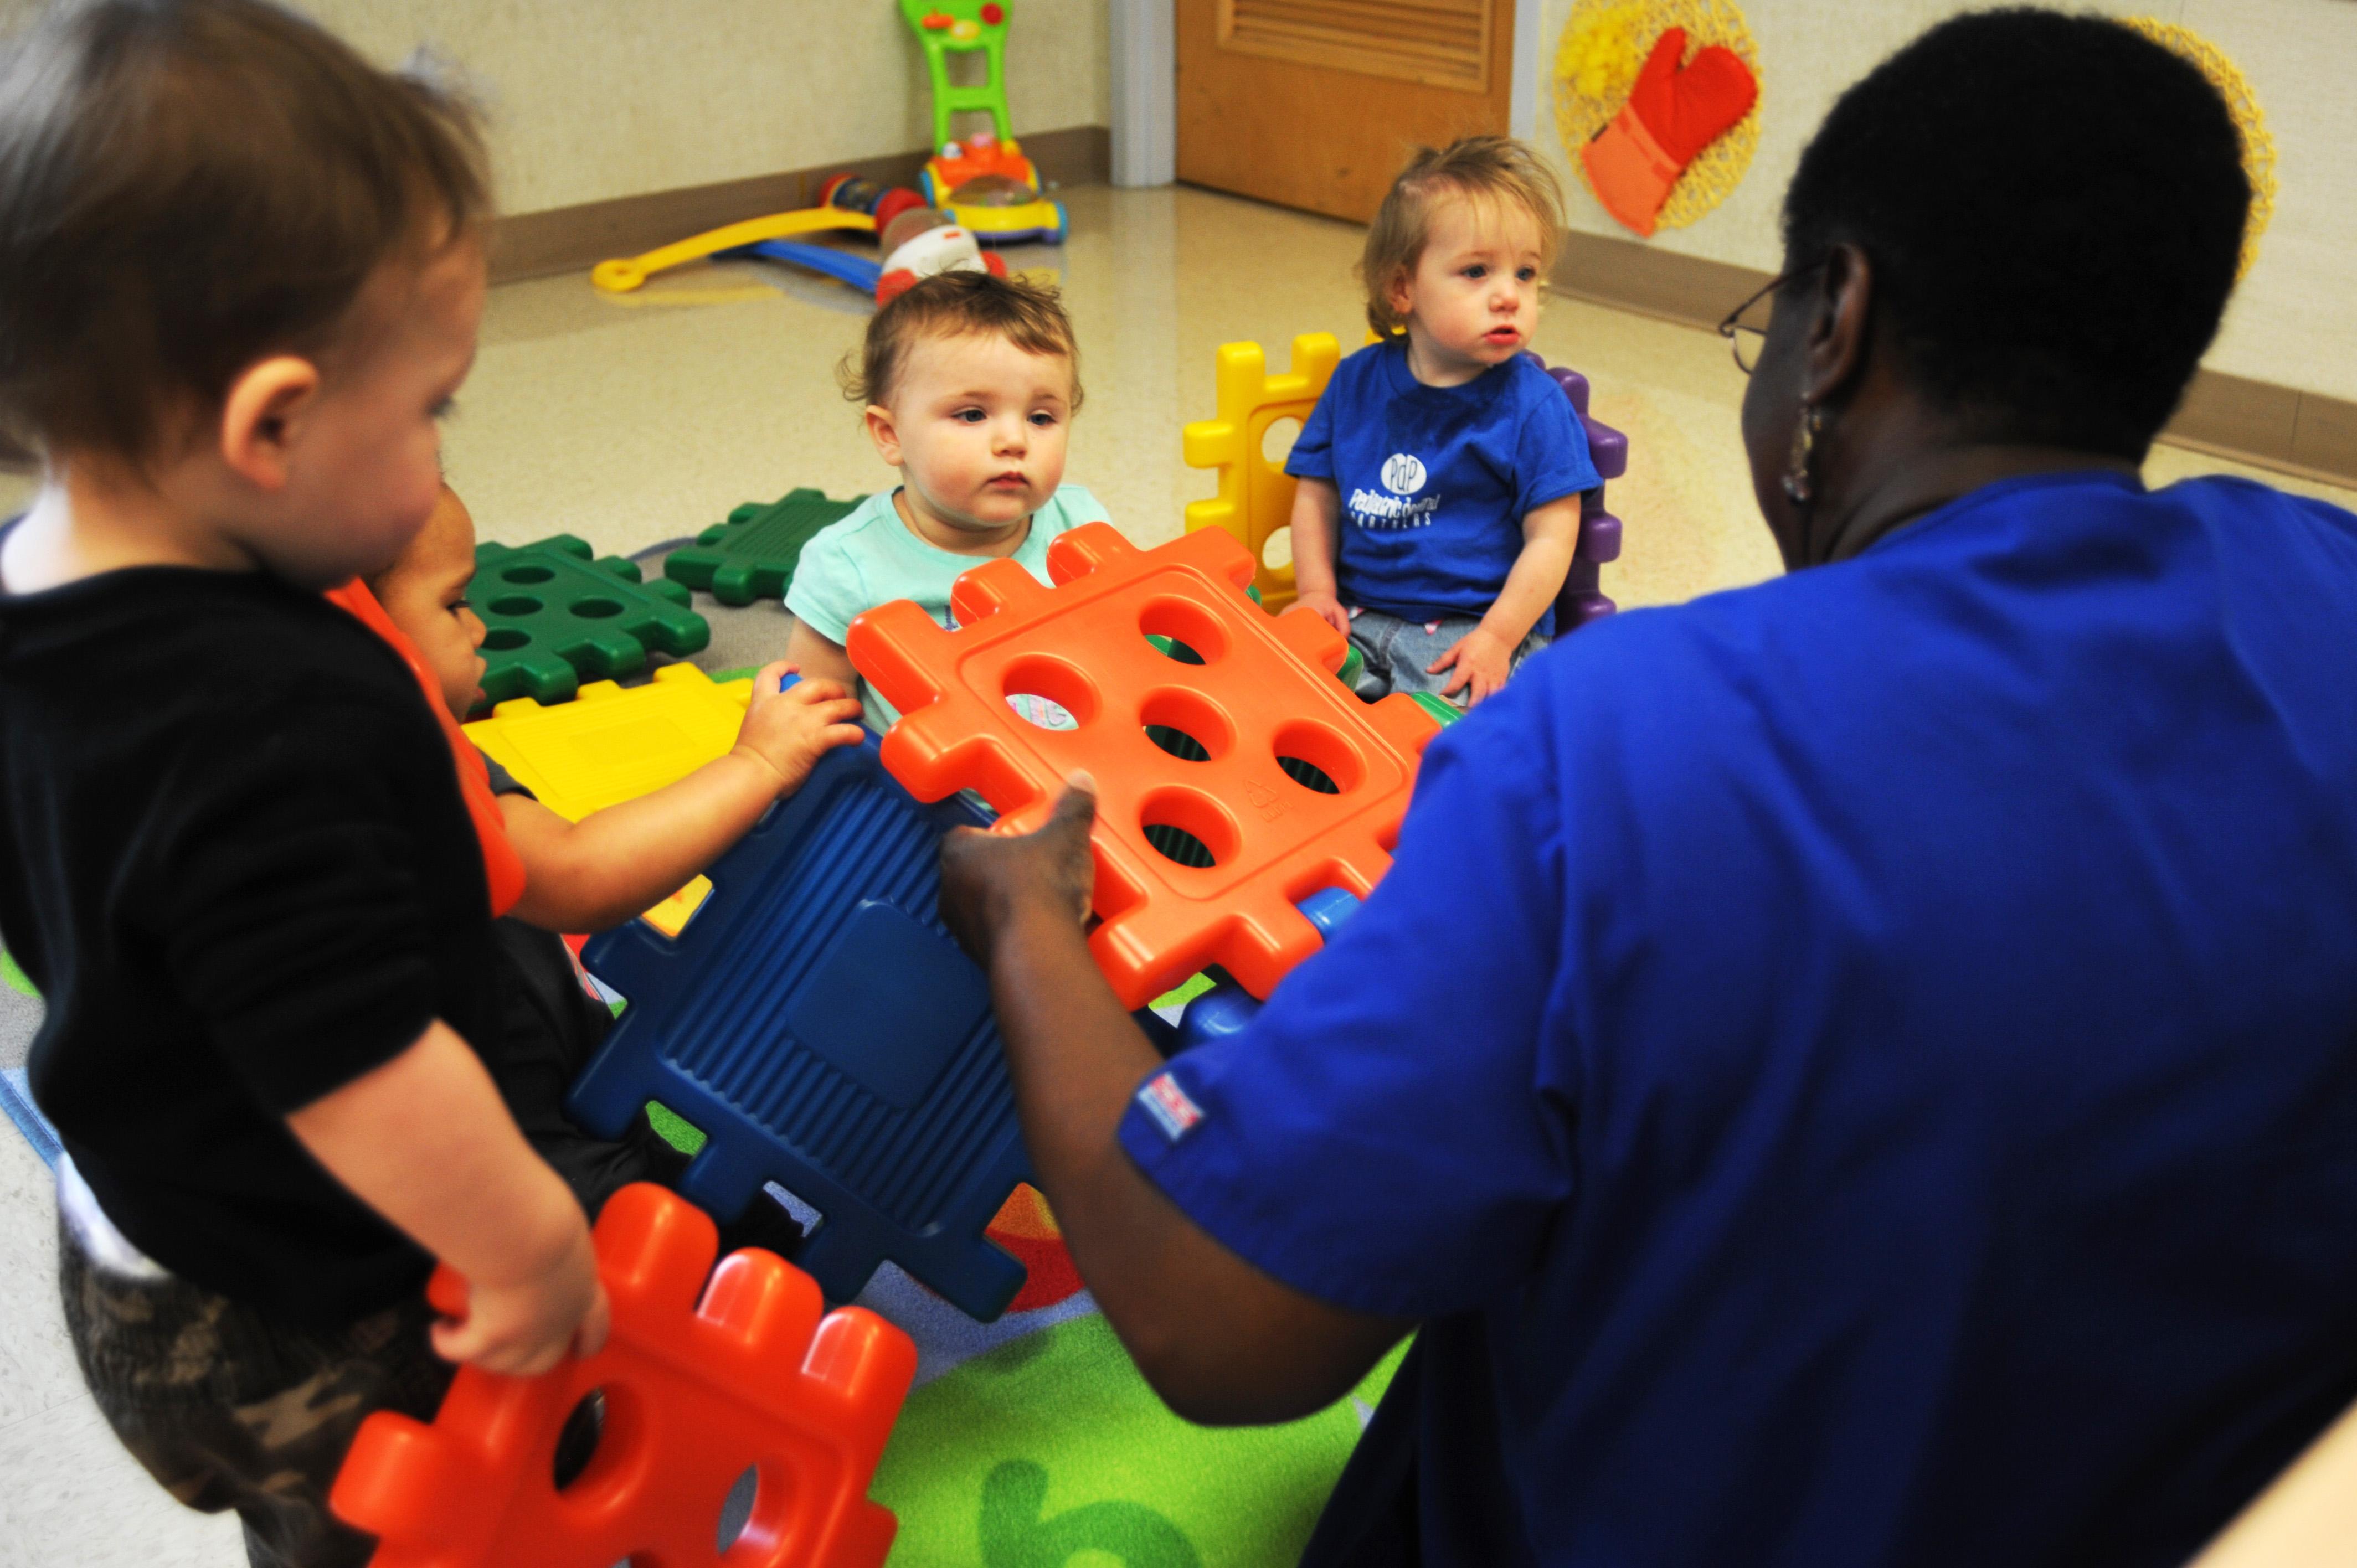 Professional Child Care Services